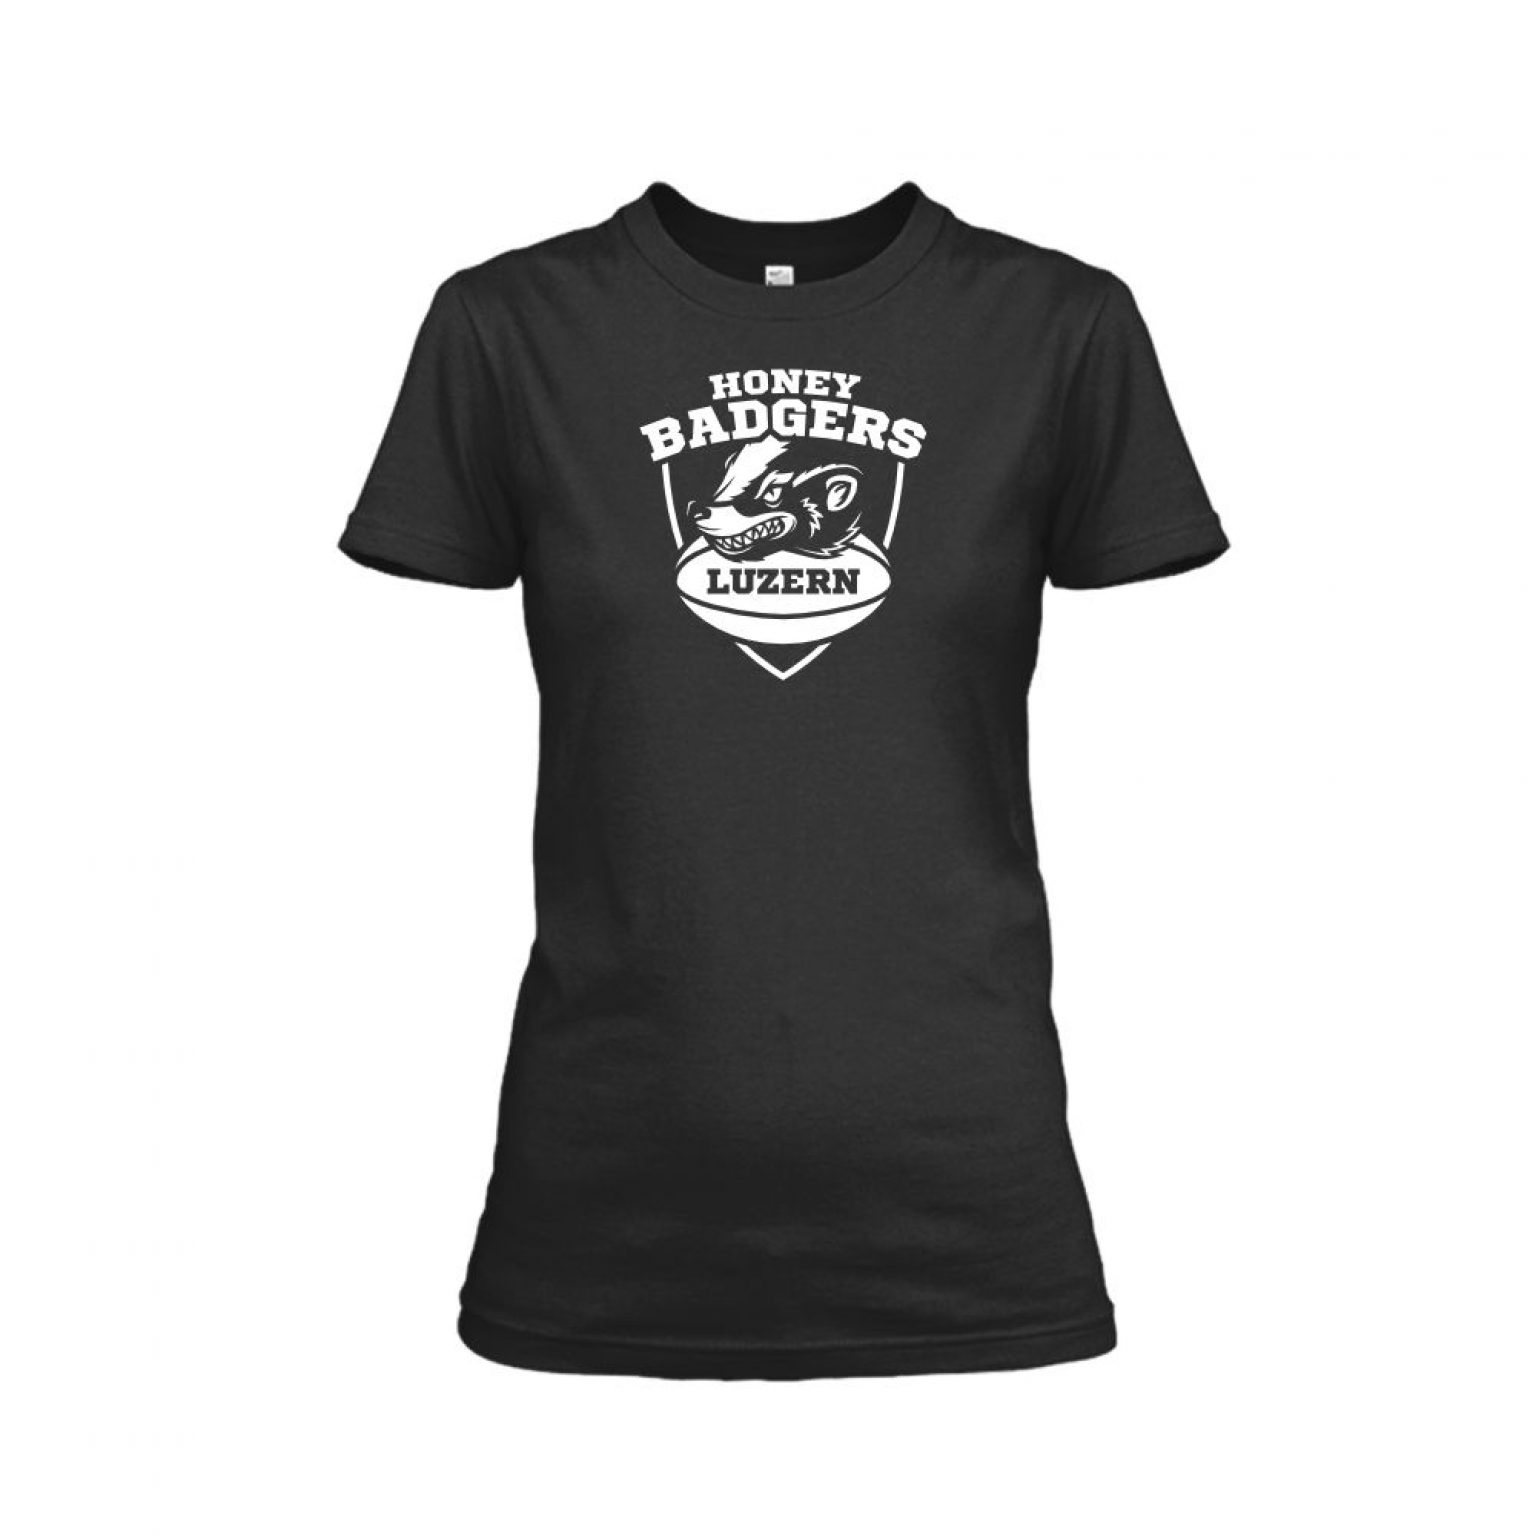 honeybadgerV2 shirt damen black front